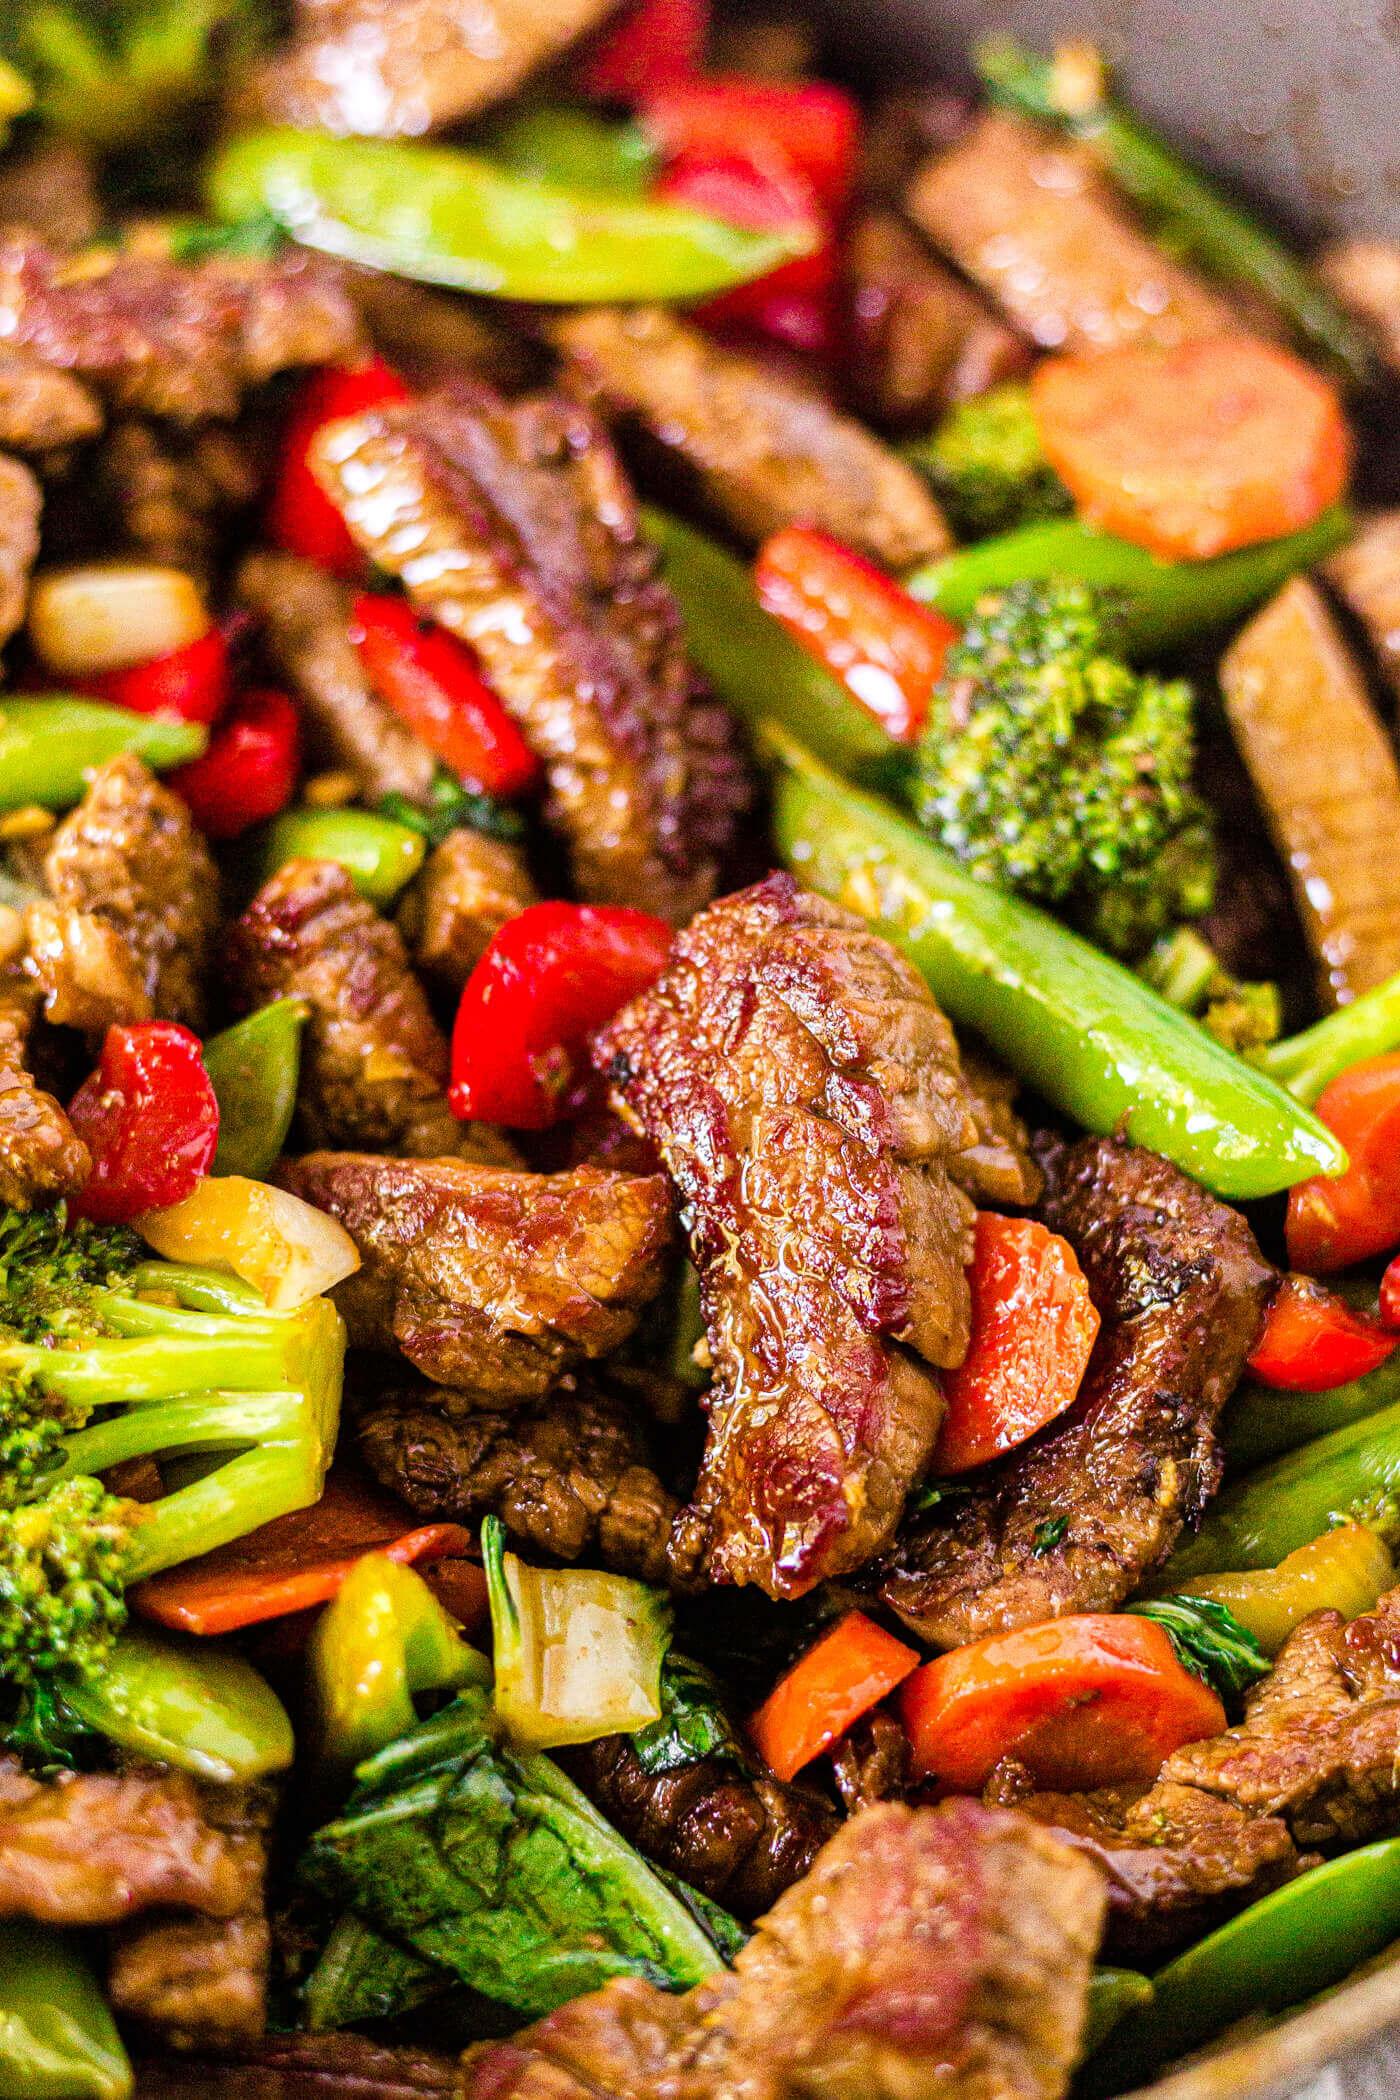 steak stir fry in a pan with veggies and teriyaki sauce